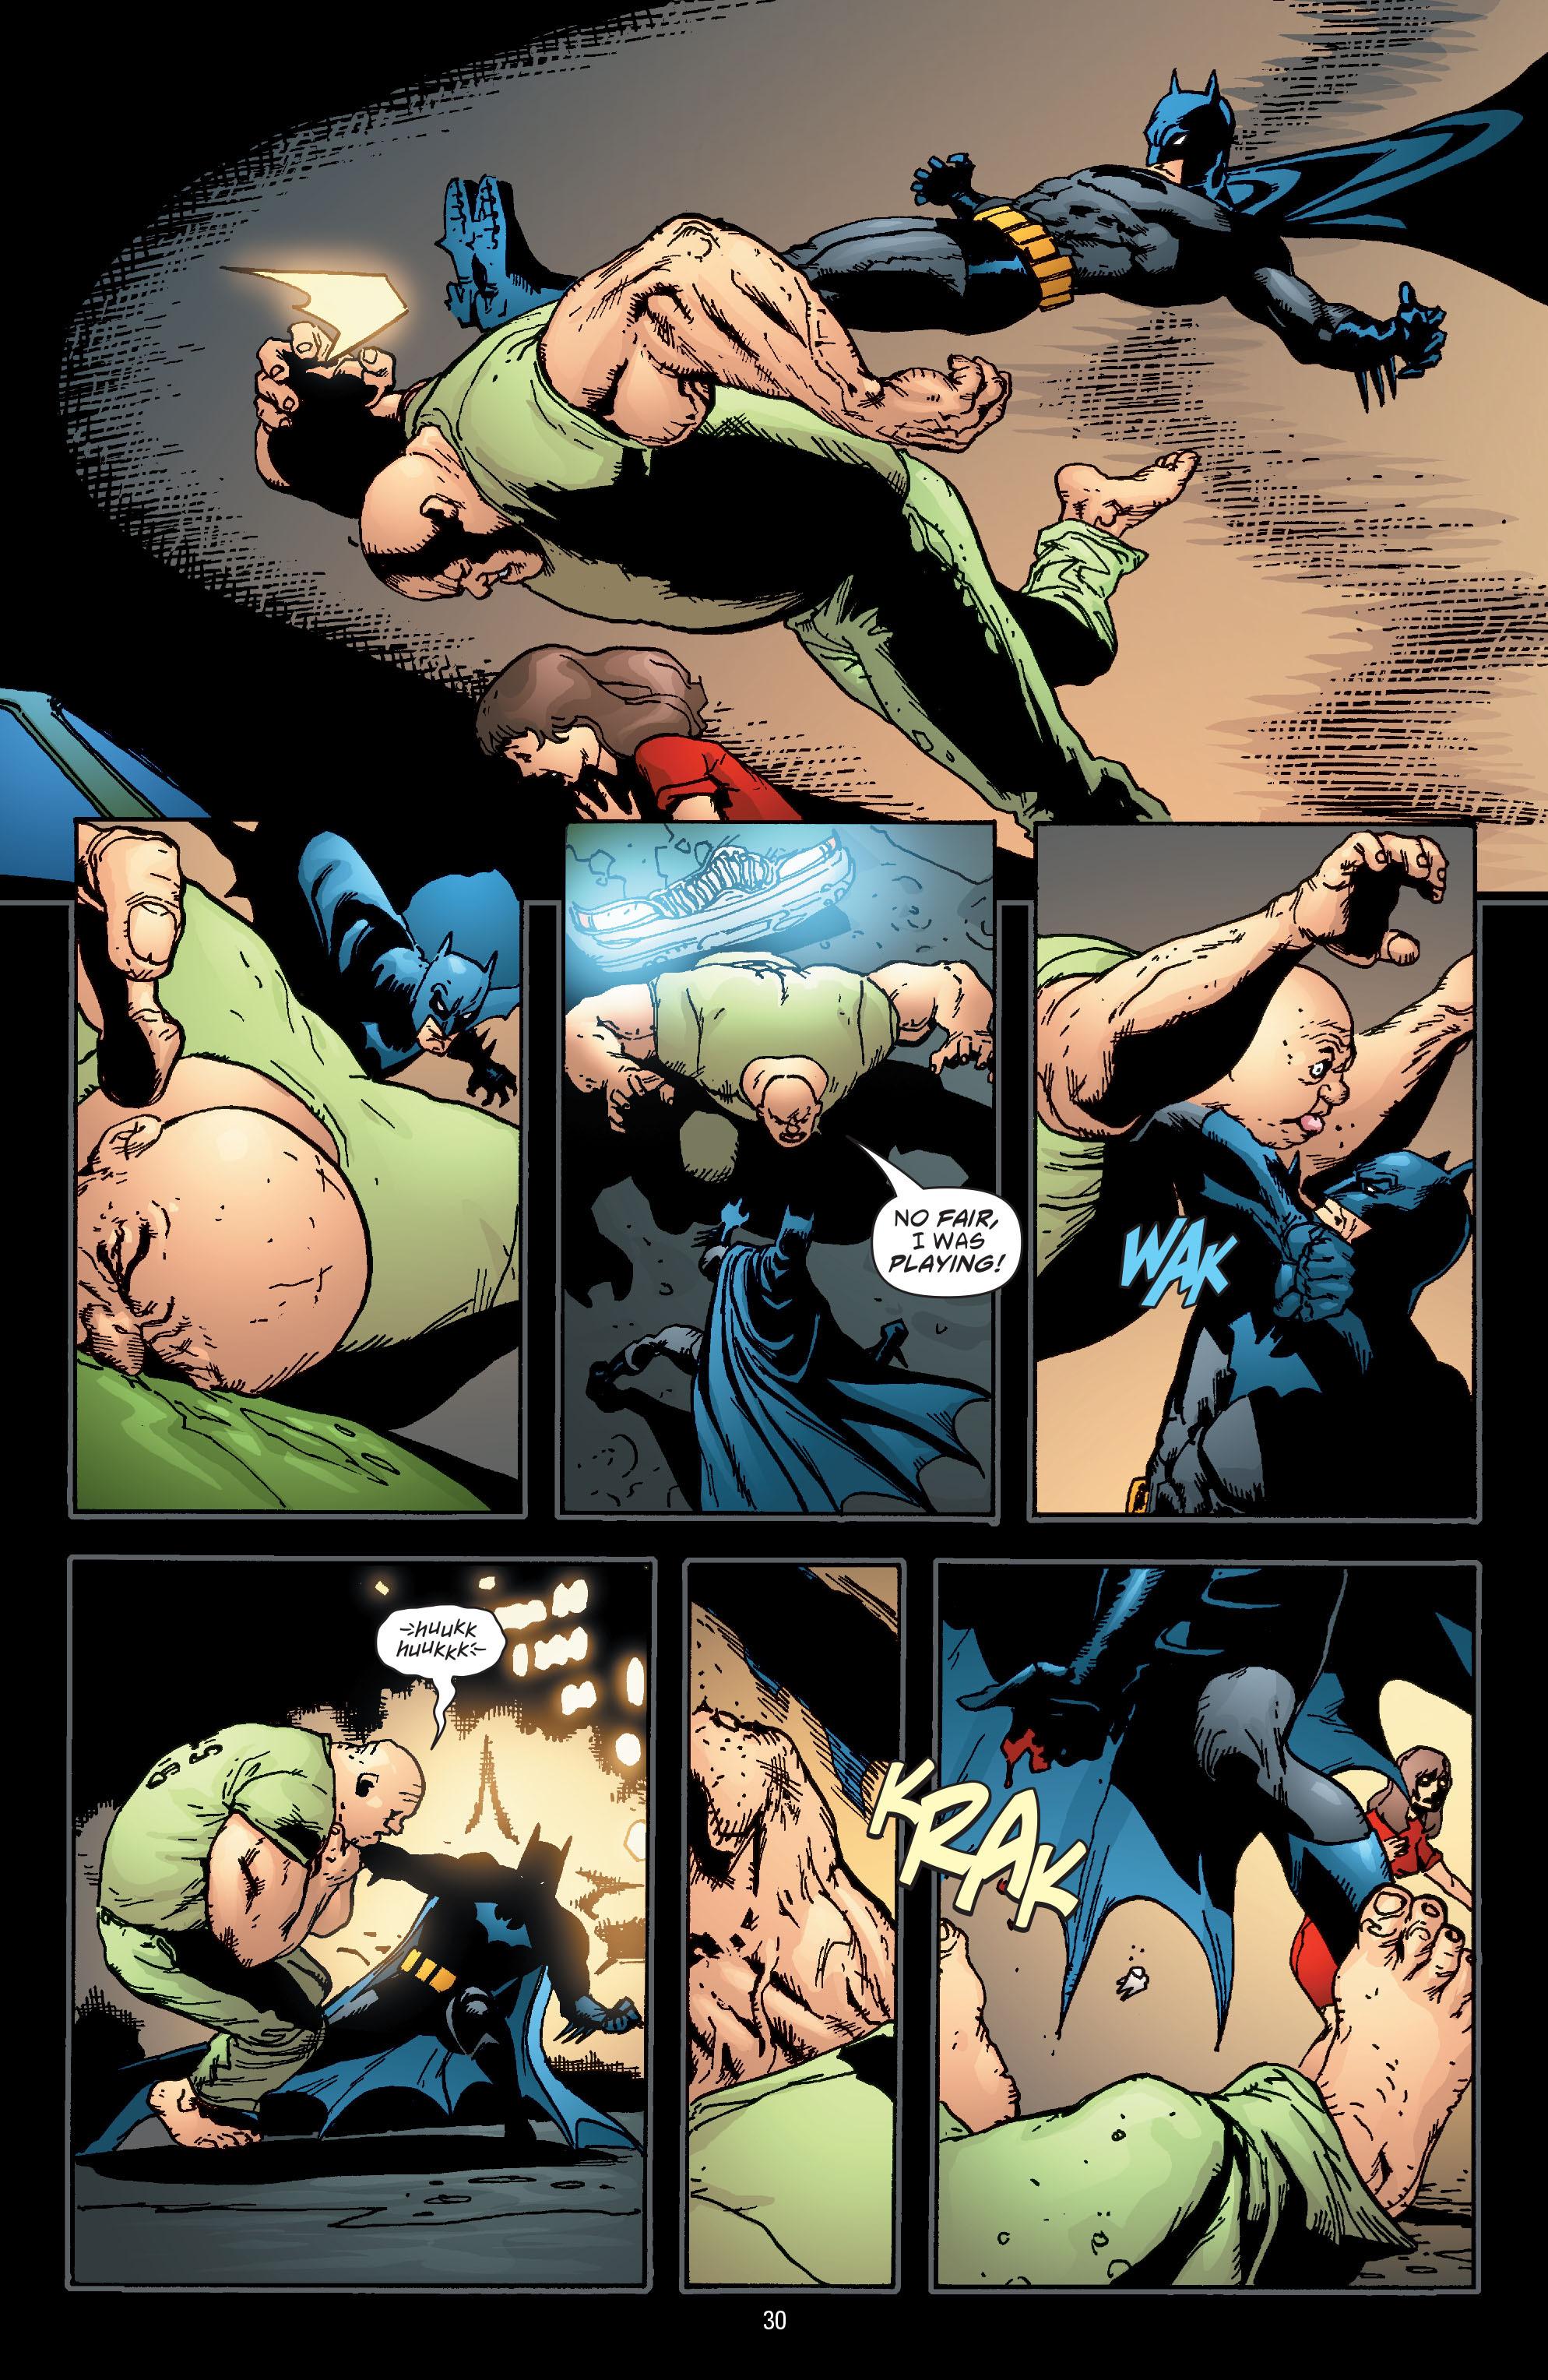 Batman: The Man Who Laughs chap 1 pic 31